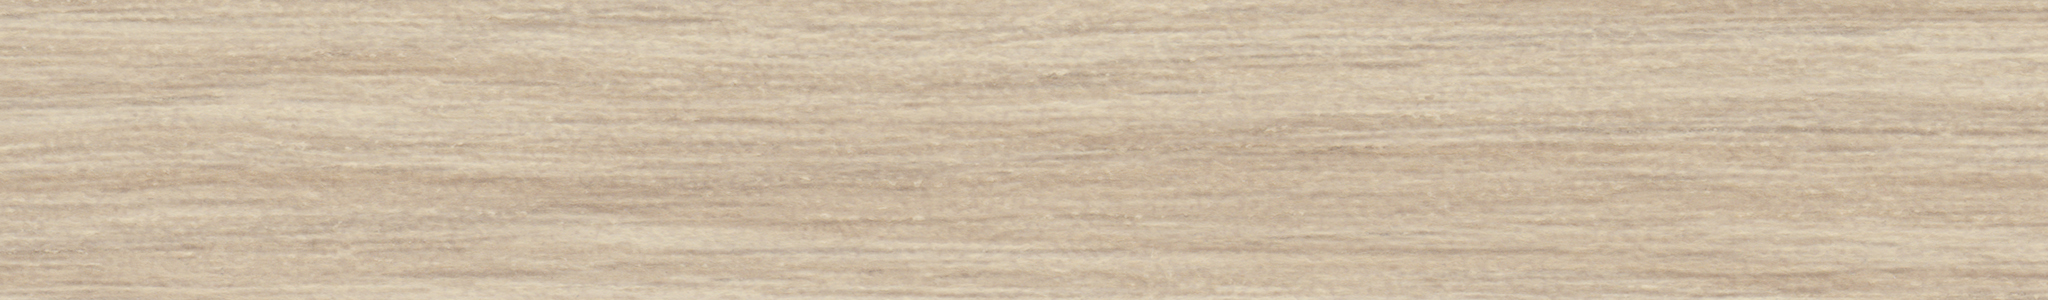 HD 244047 Кромка ABS Дуб Вирджиния - Поры - Мягкая Матовая